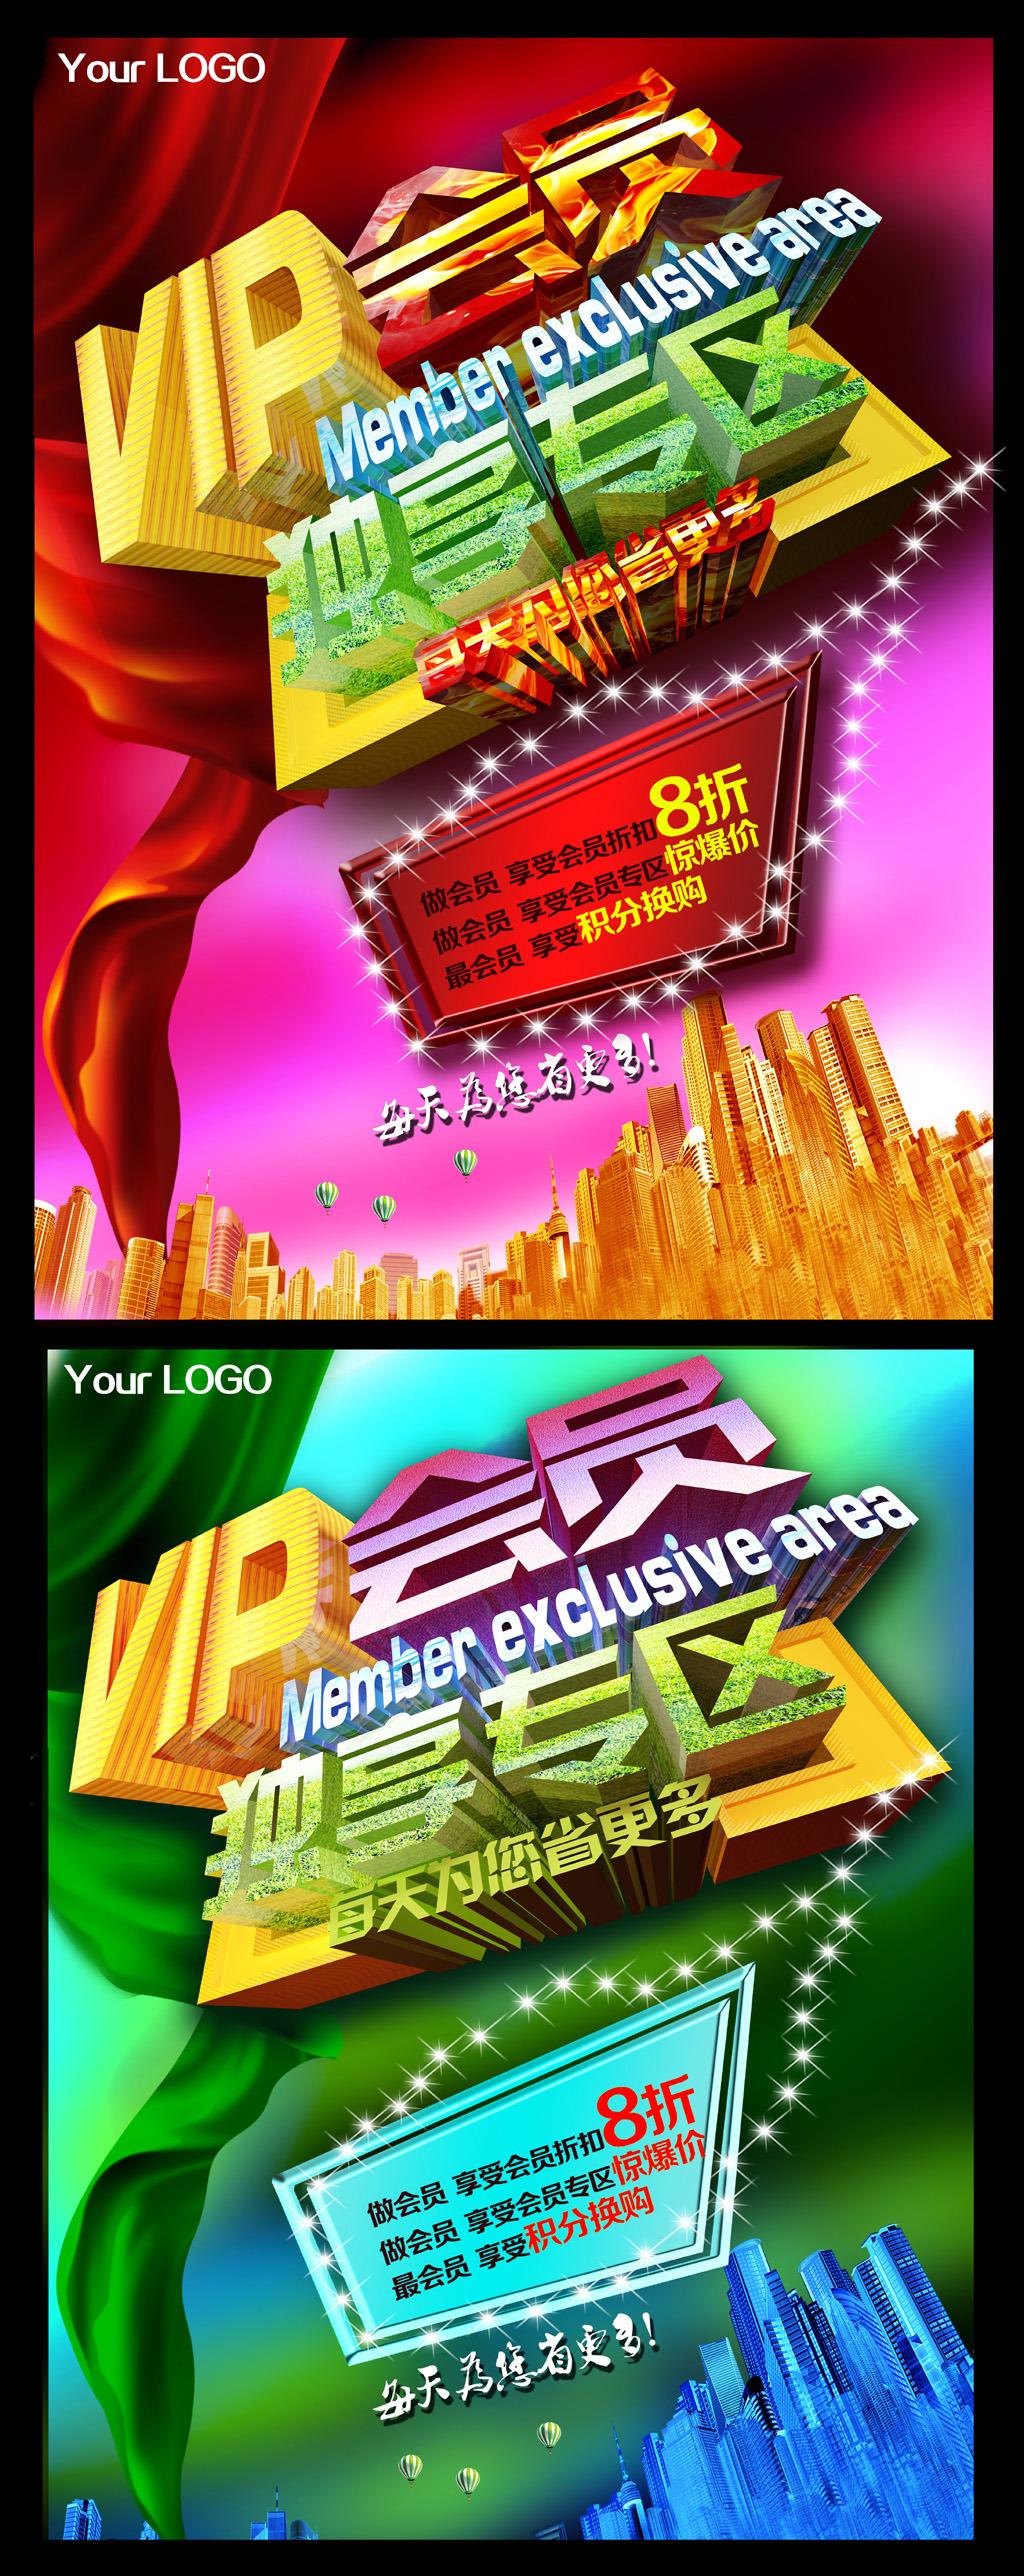 vip会员招募商业促销海报模板